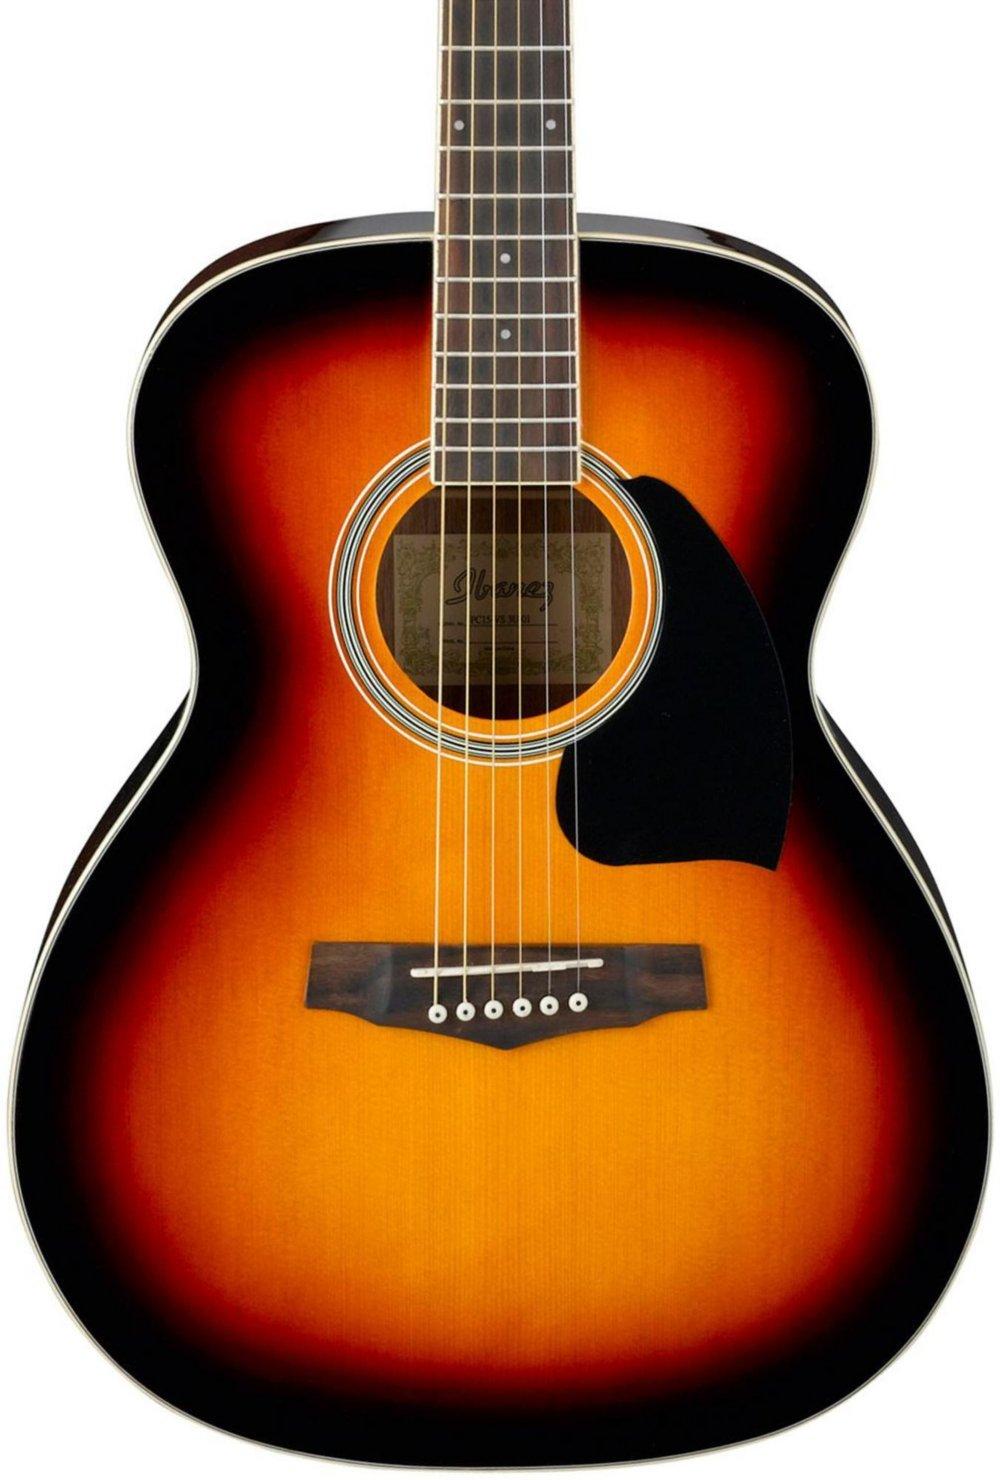 Ibanez アイバニーズ Performance Series PC15 Grand Concert アコースティックギター Vintage Sunburst アコースティックギター アコギ ギター (並行輸入)   B00B7AJFFI